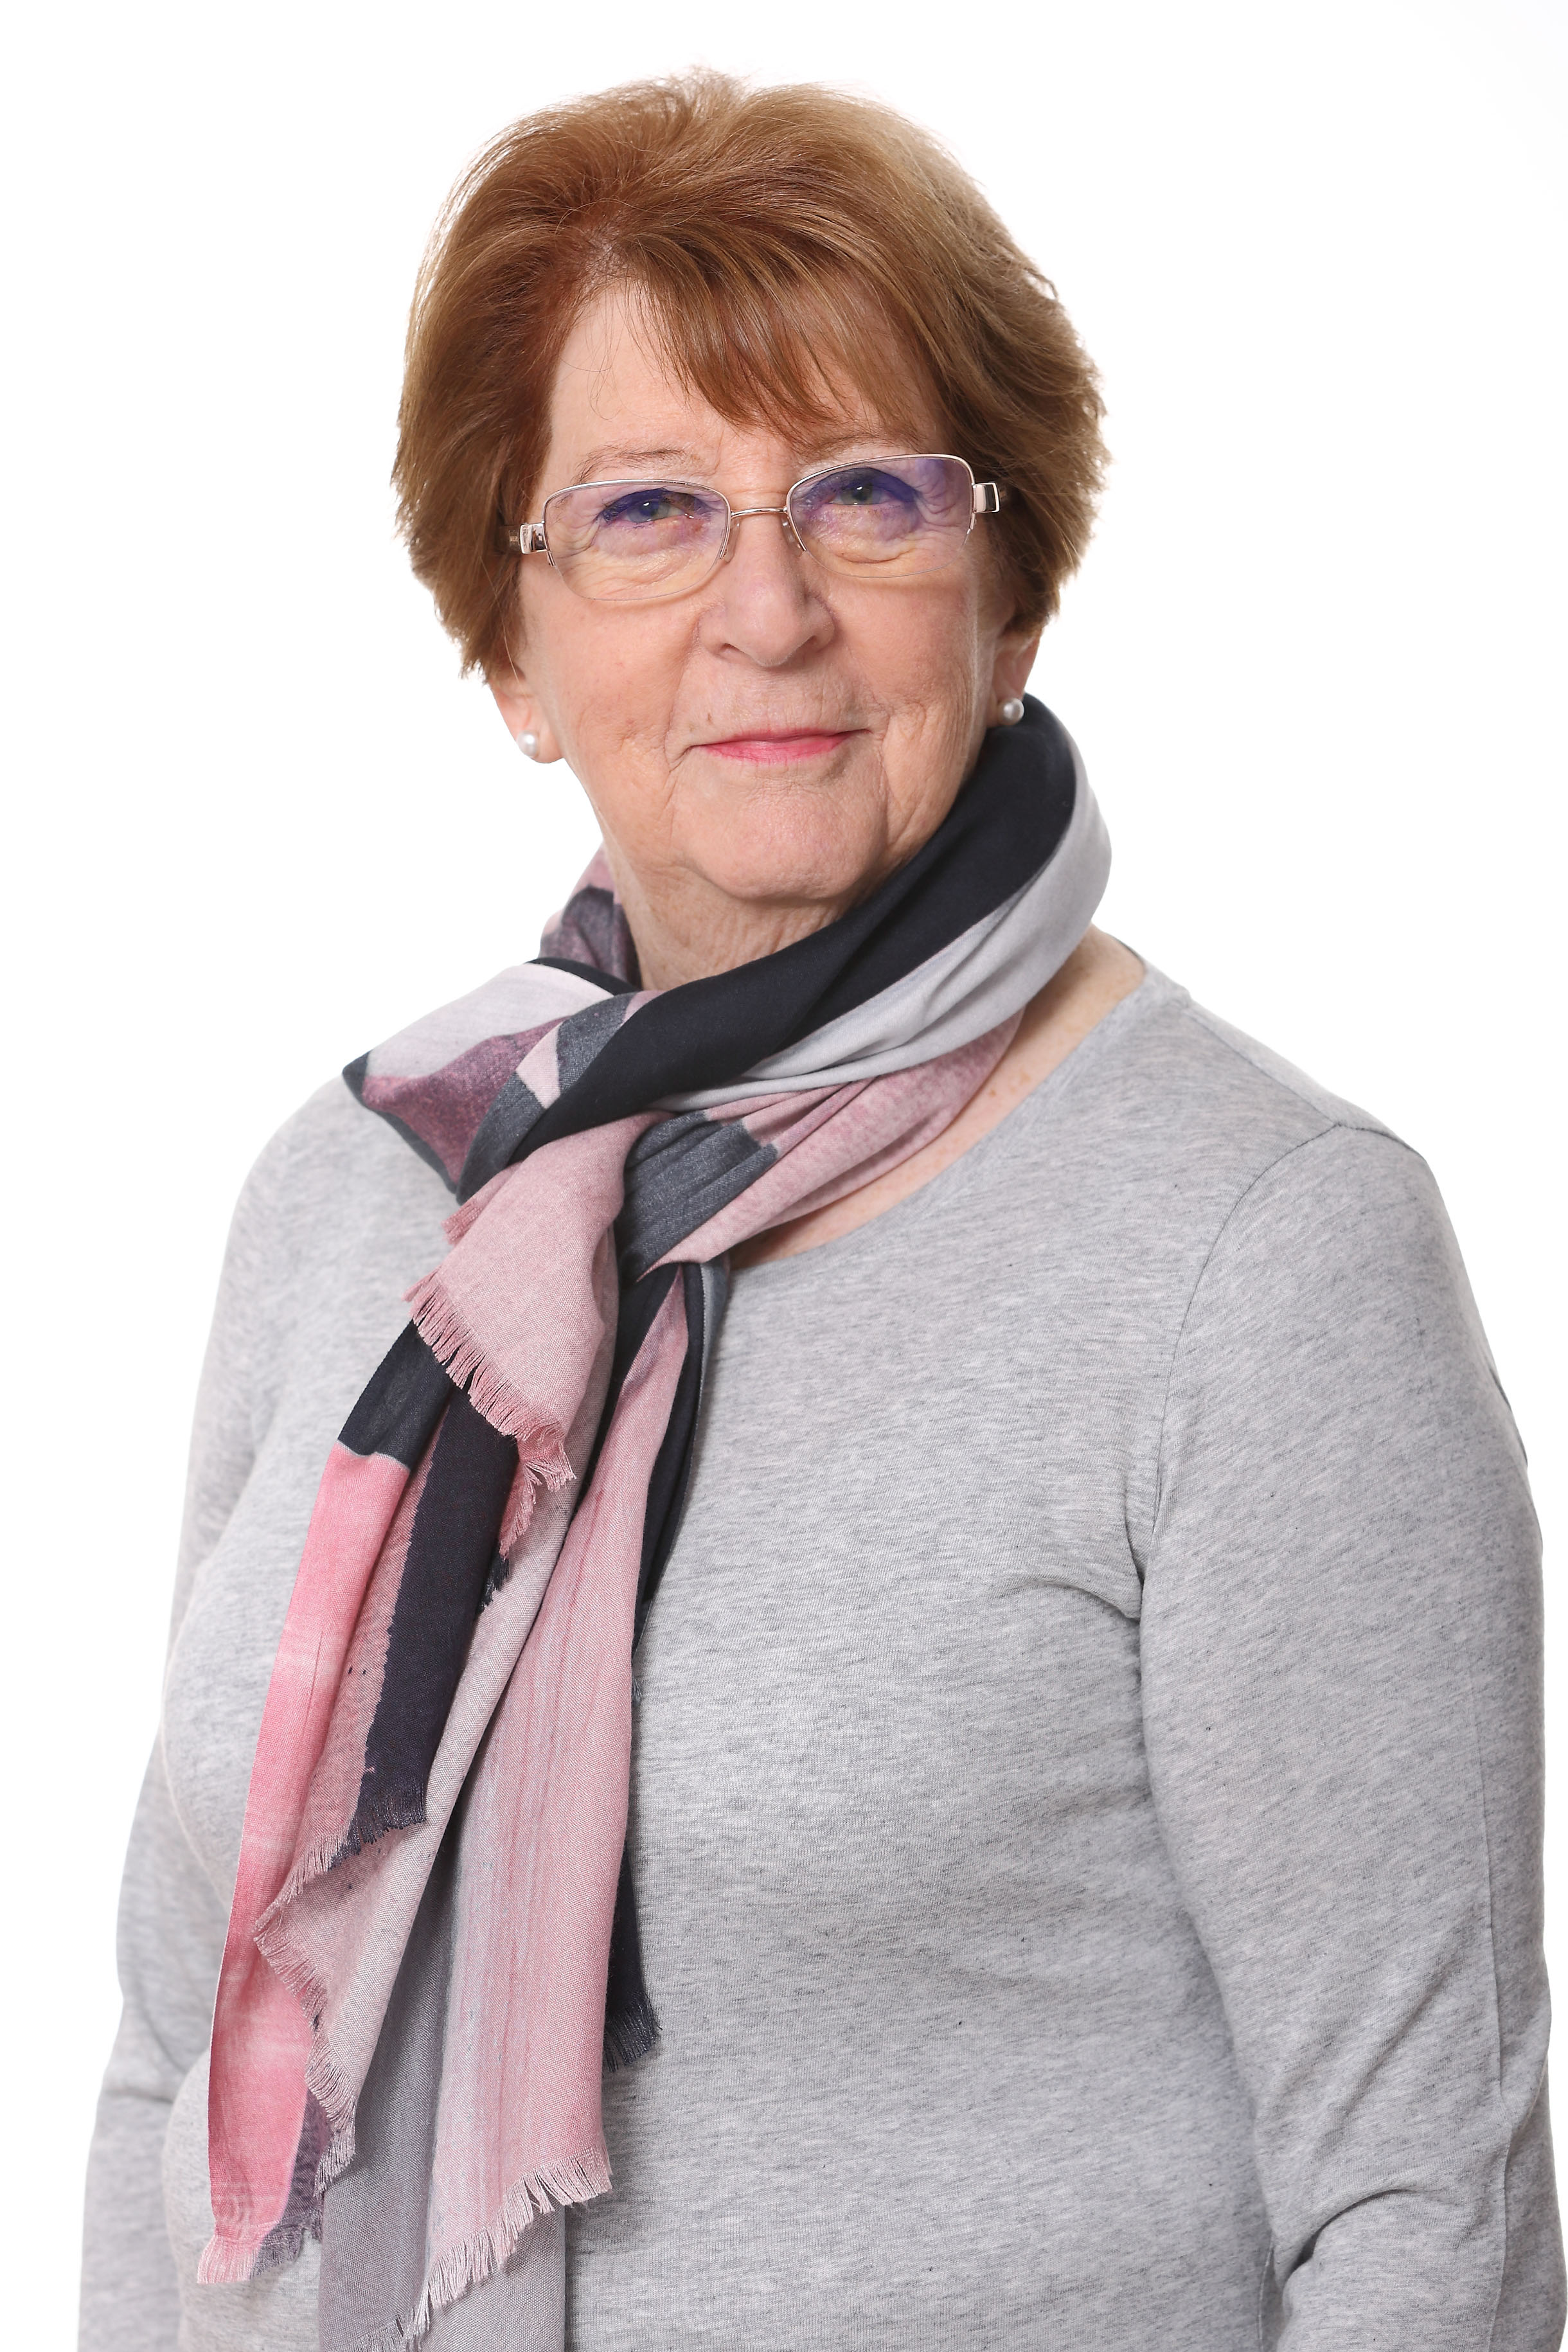 Sheila Ince